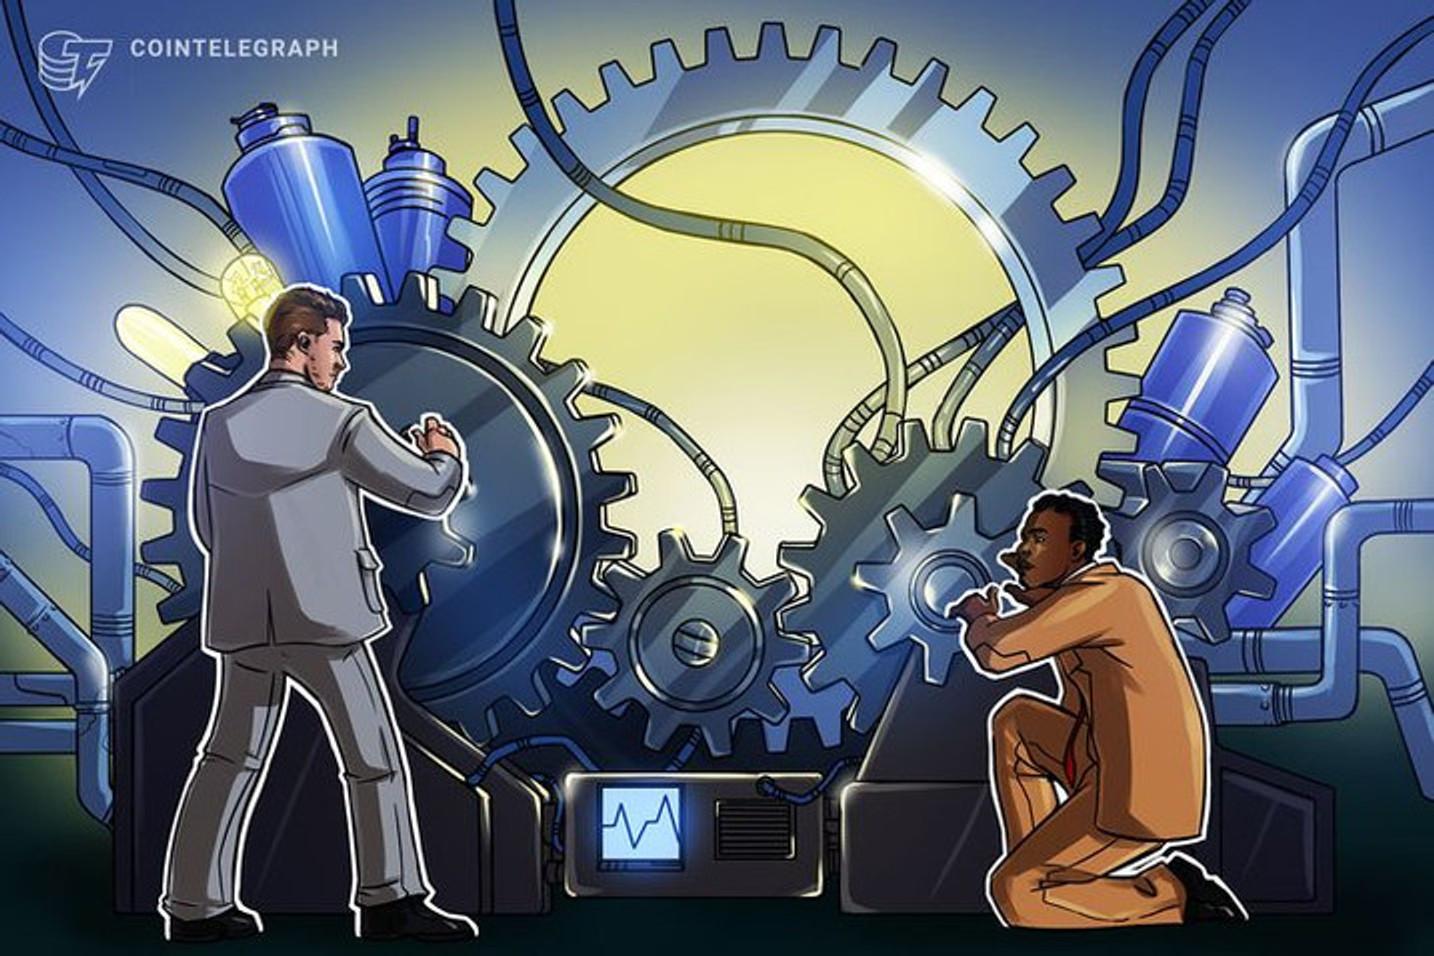 Empresas tecnológicas en España crean soluciones basadas en Blockchain para automatización de procesos